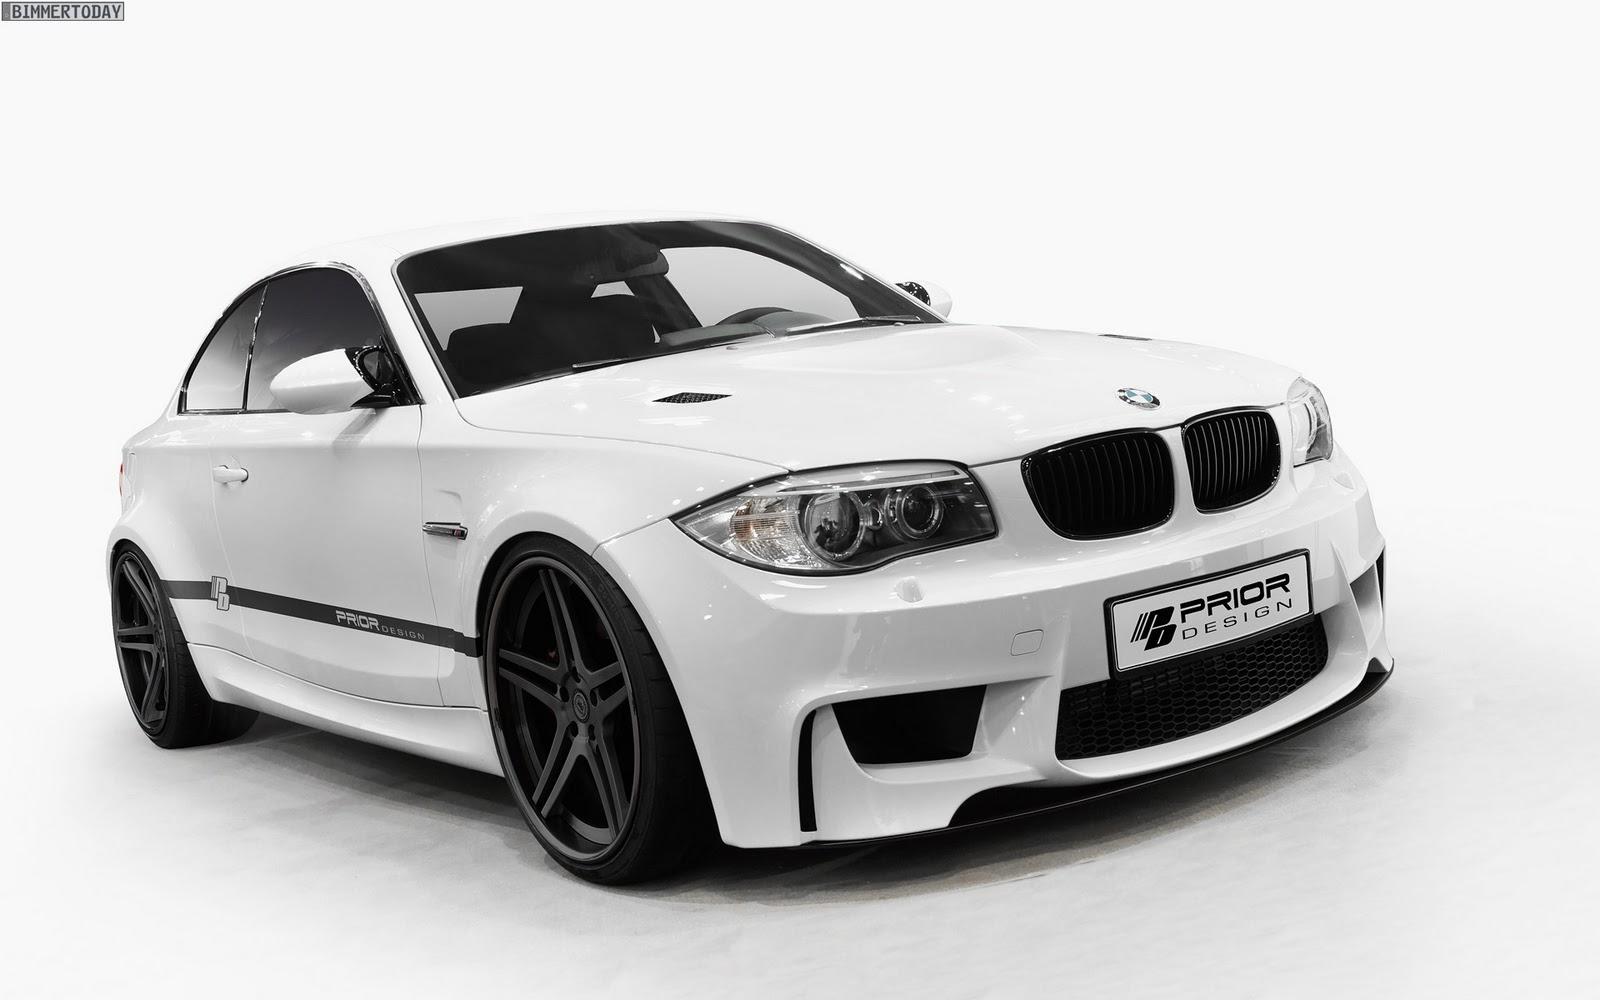 http://1.bp.blogspot.com/-SneIxJdwKyQ/TvNozahMZ_I/AAAAAAAAE8Y/FhiVnWLXSc4/s1600/BMW-1er-Coup%25C3%25A9-E82-Wide-Body-Kit-Prior-Design-02.jpg